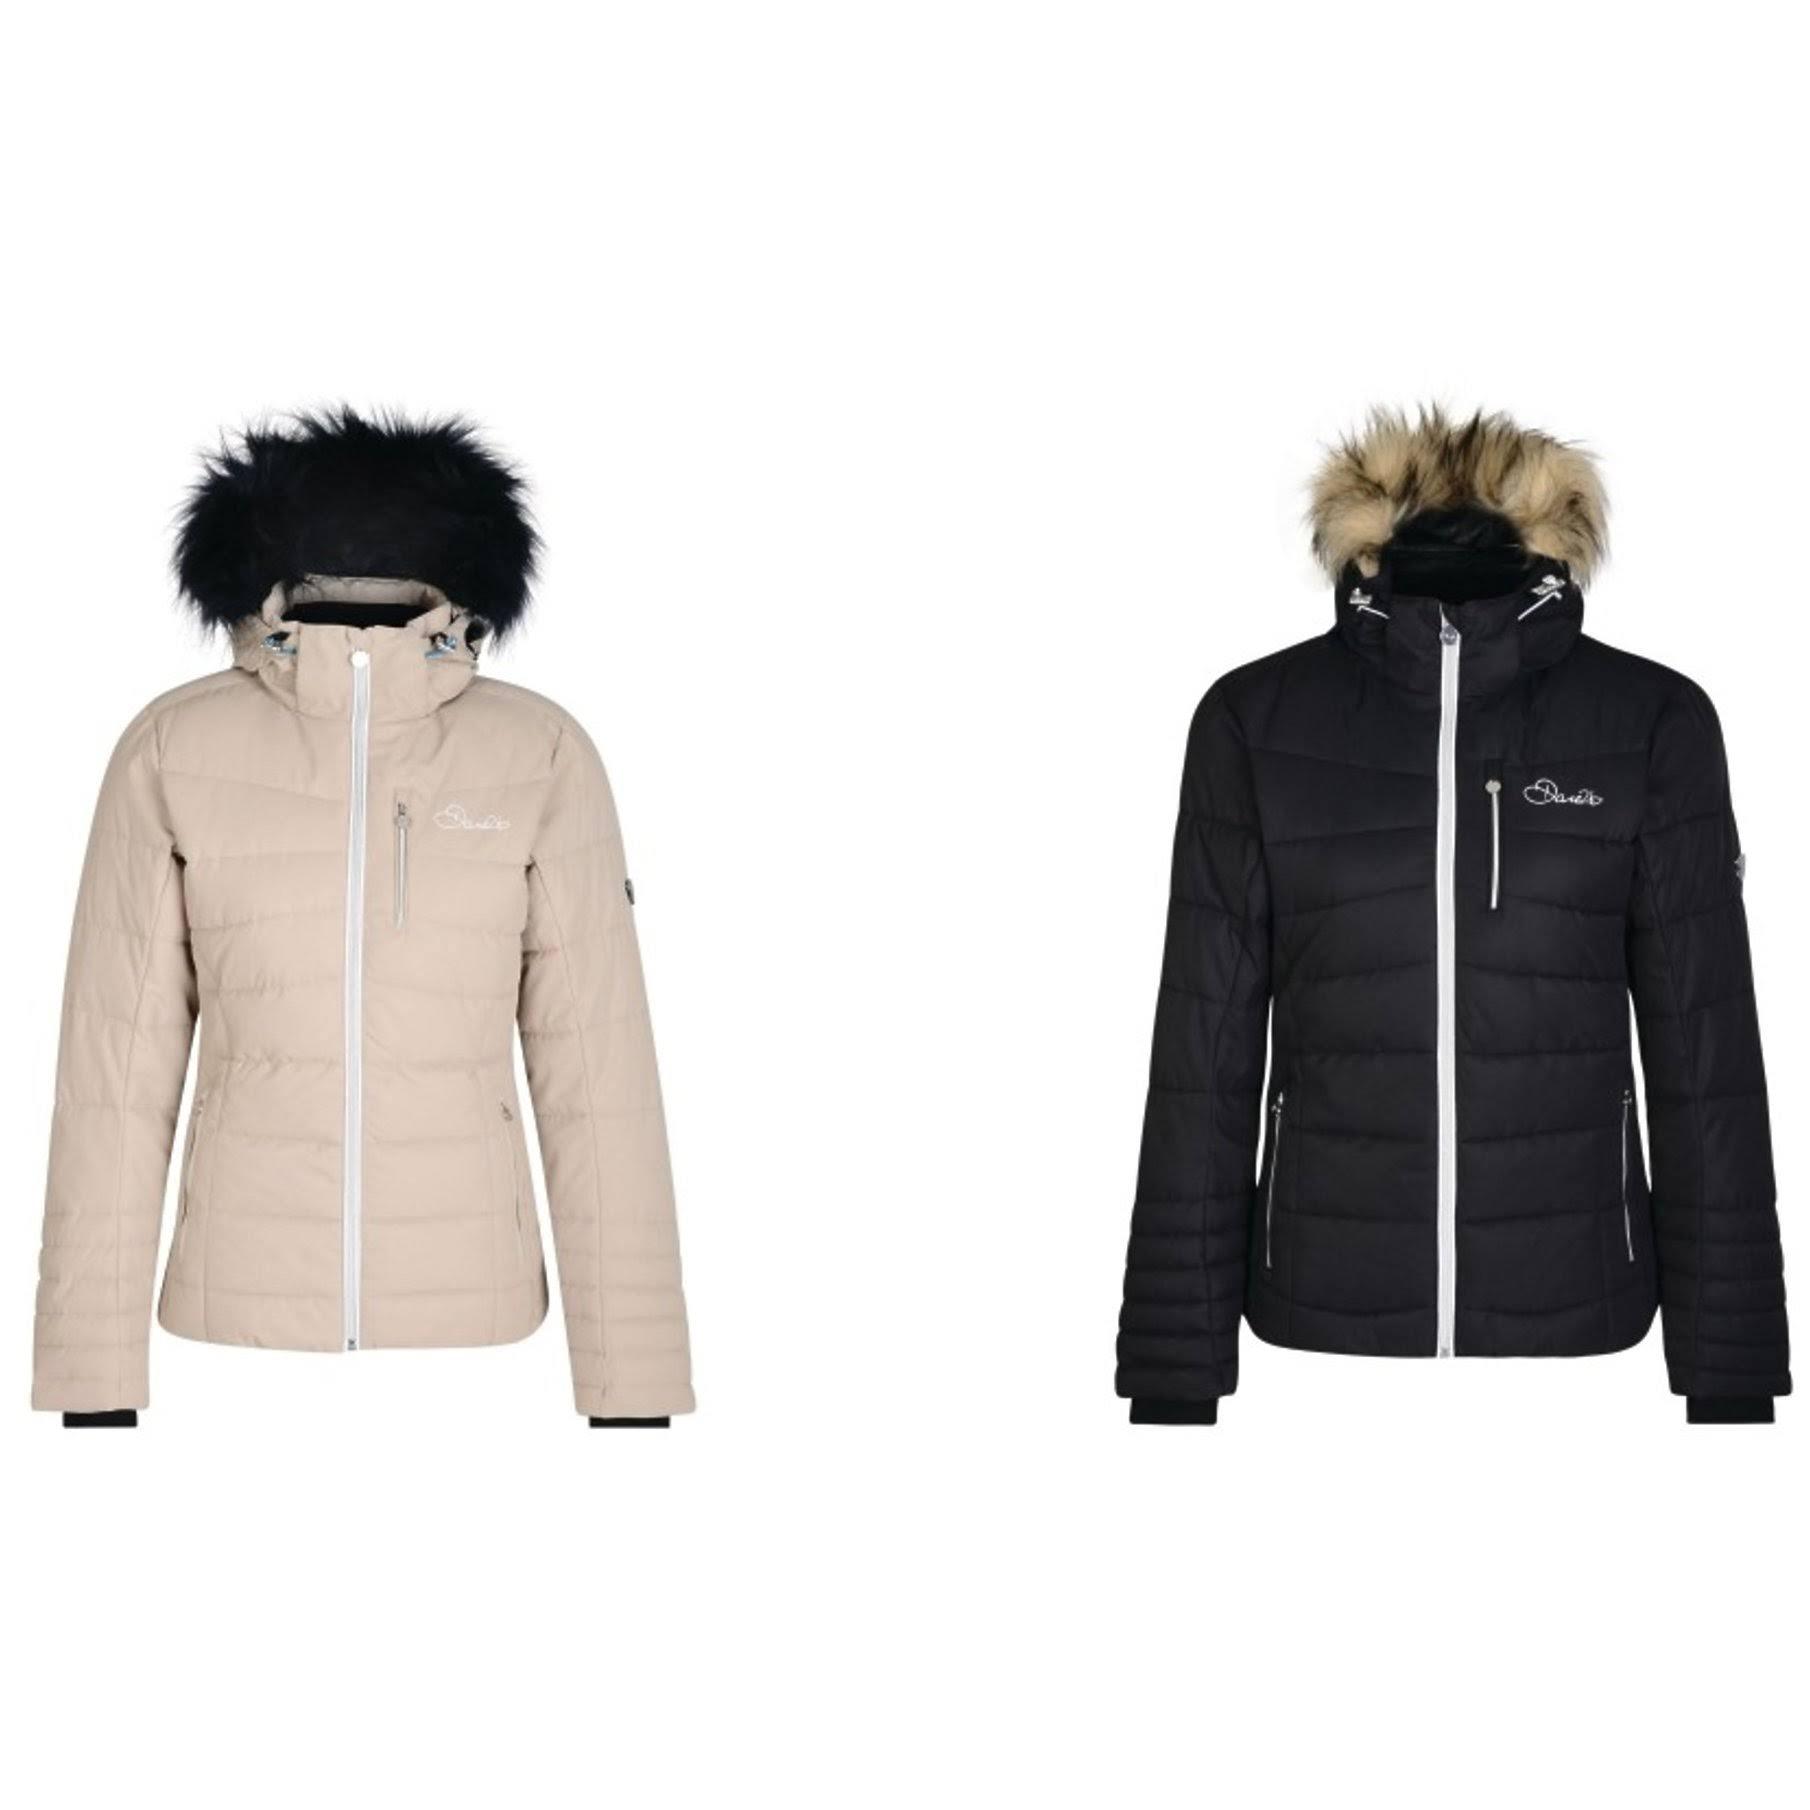 Ski Curator Jacket Utrg3915 Para 2b Mujer Dare 29 Señoras qIxR1wOpX